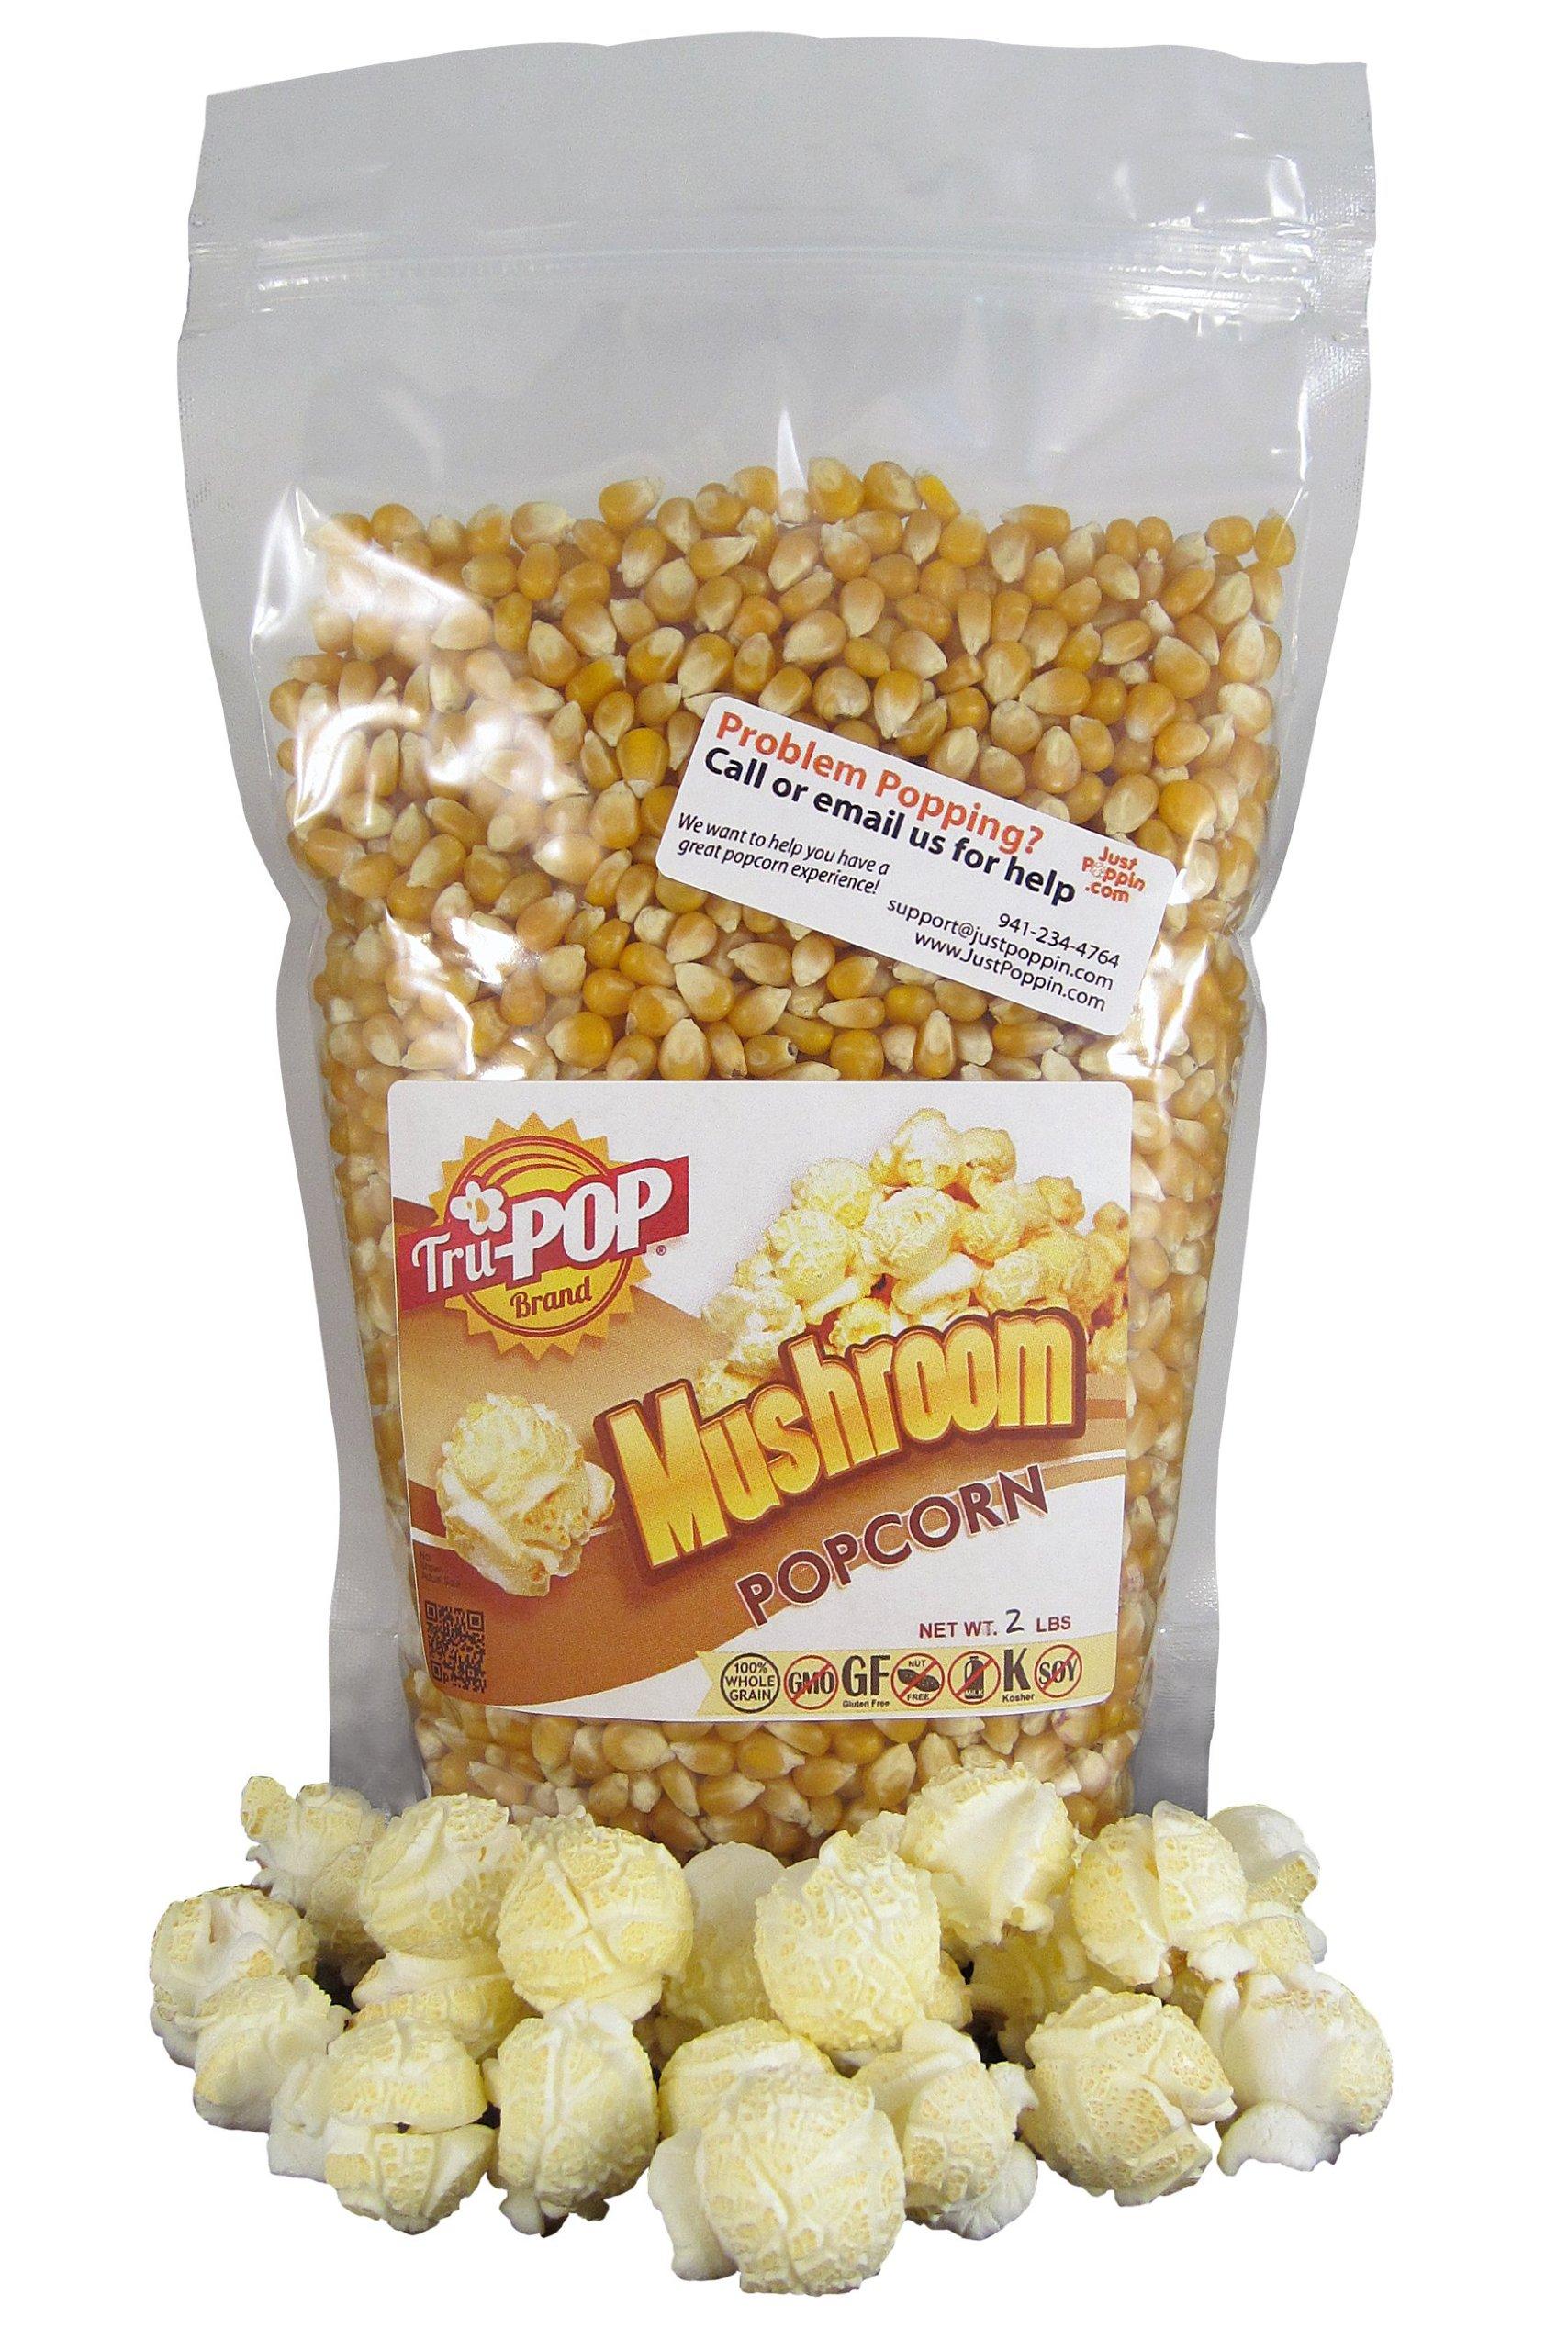 Mushroom Popcorn Kernels 2 Lbs - Just Poppin Brand by Just Poppin